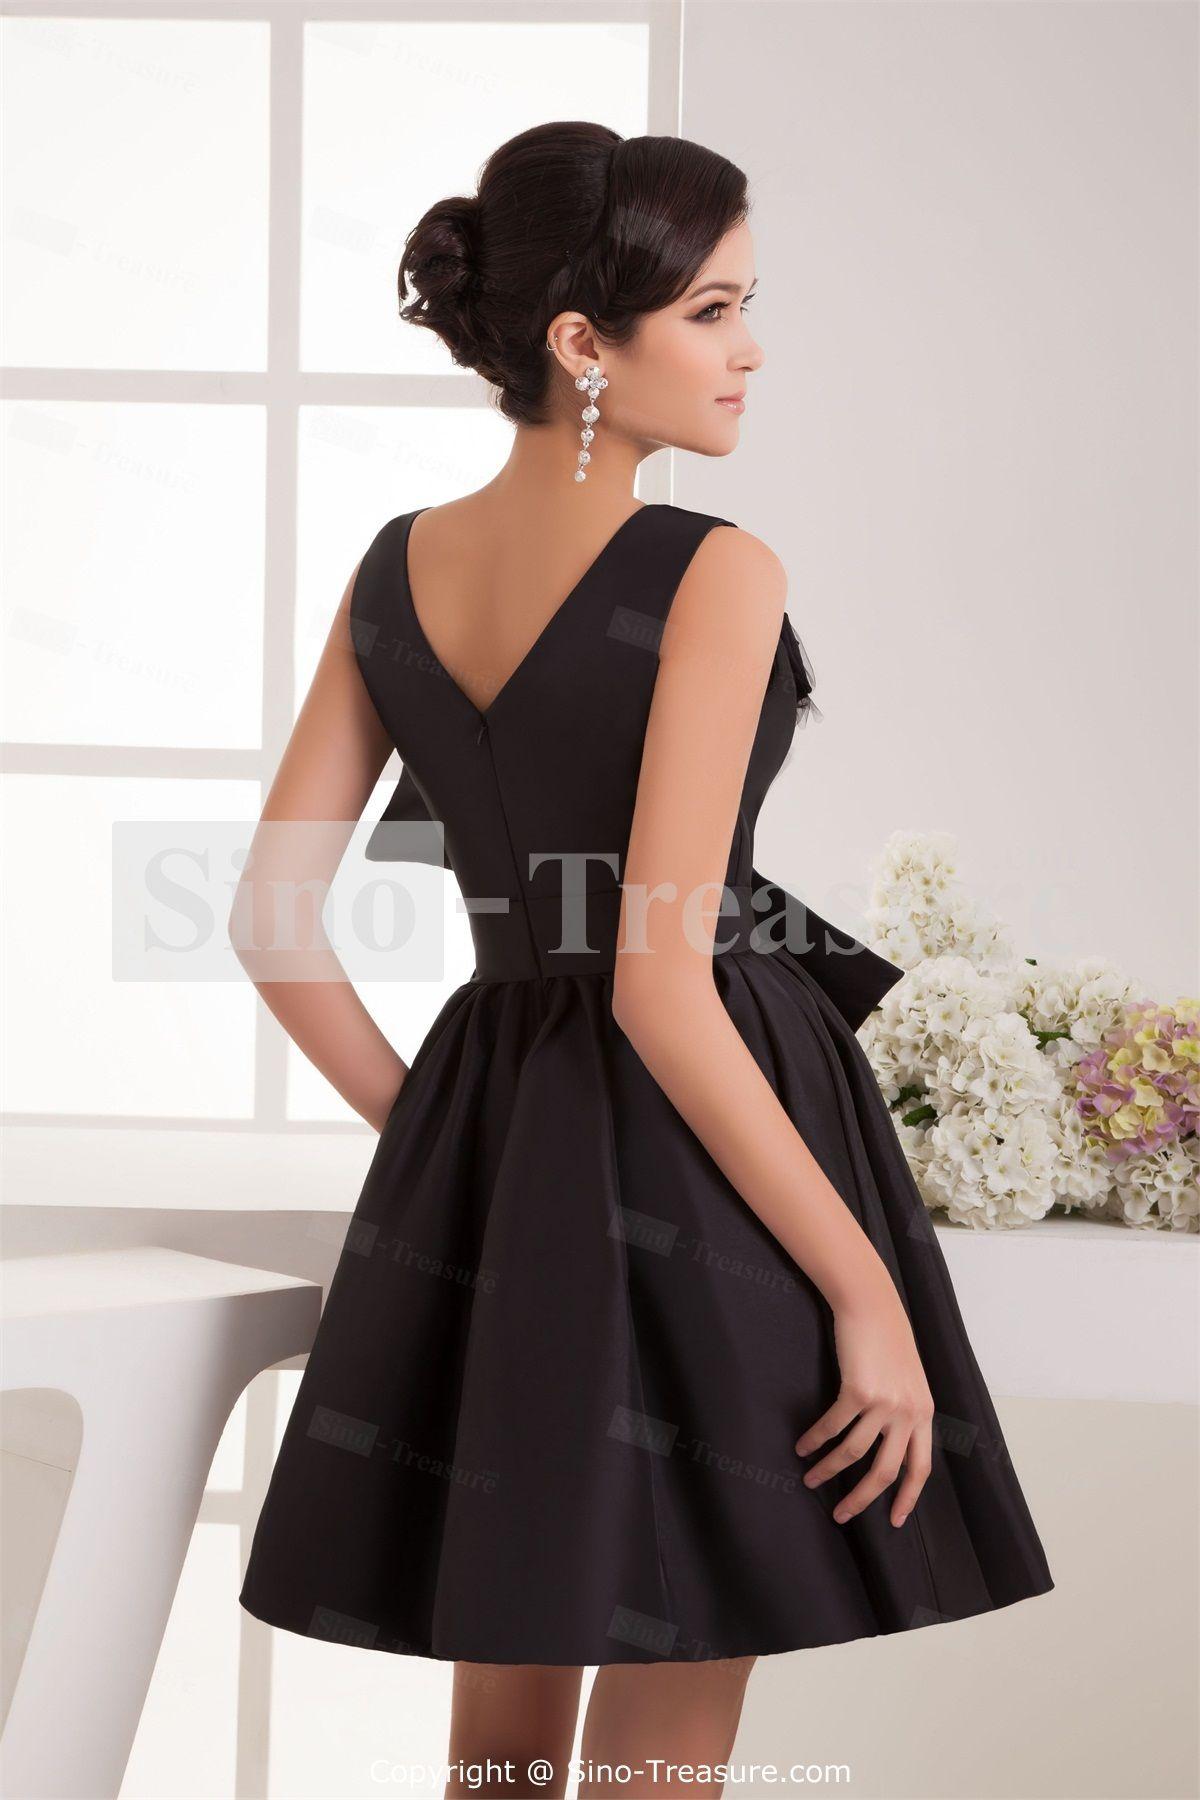 black a line cocktail dress | Gommap Blog | Cocktail Dresses ...